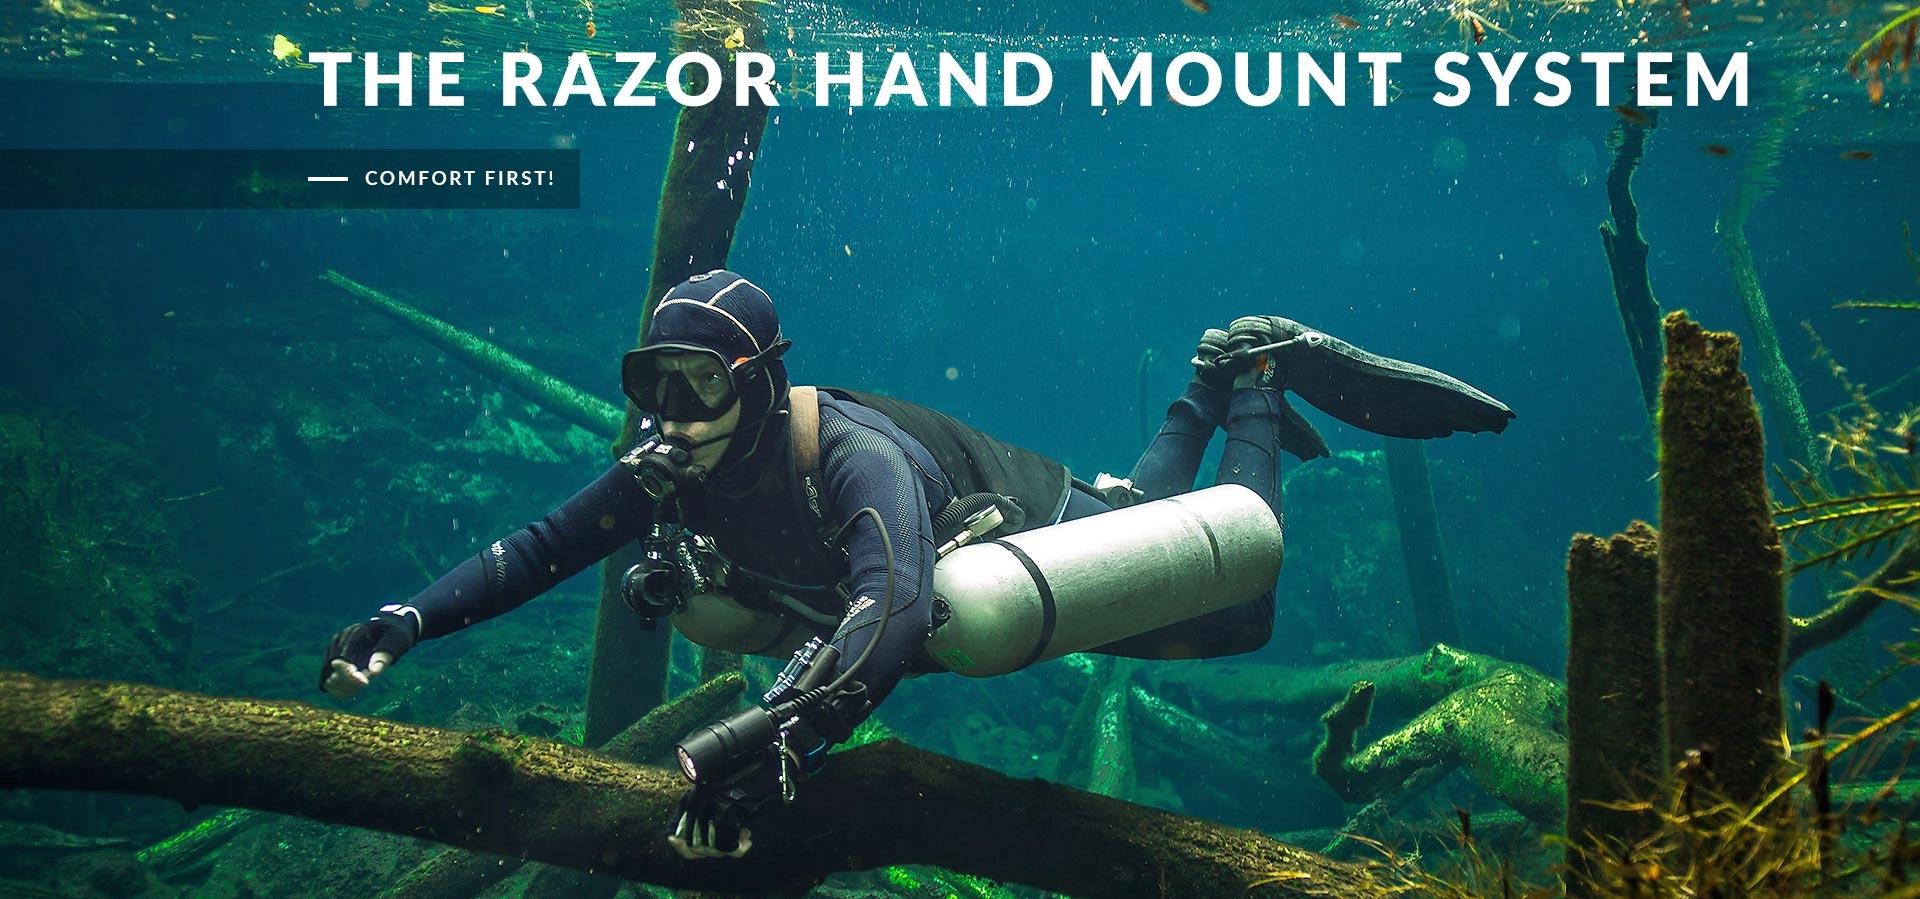 Razor Hand Mounting System